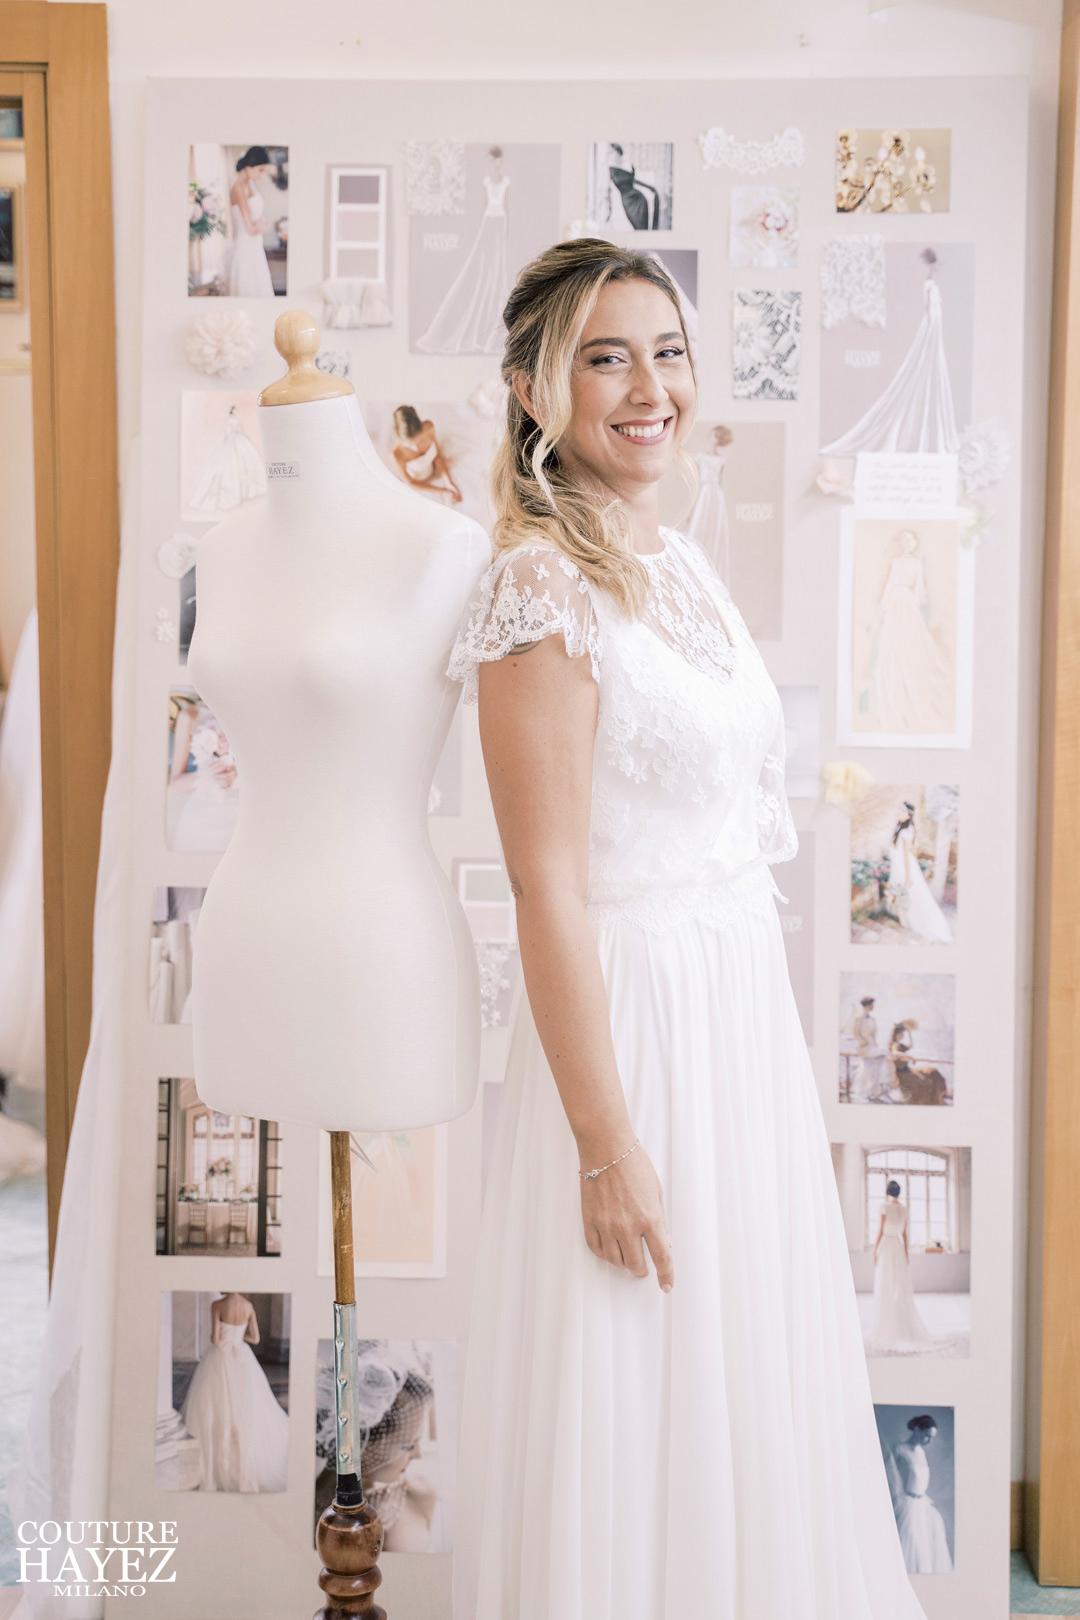 esperienza della sposa in atelier couture hayez , couture hayez milano, real bride